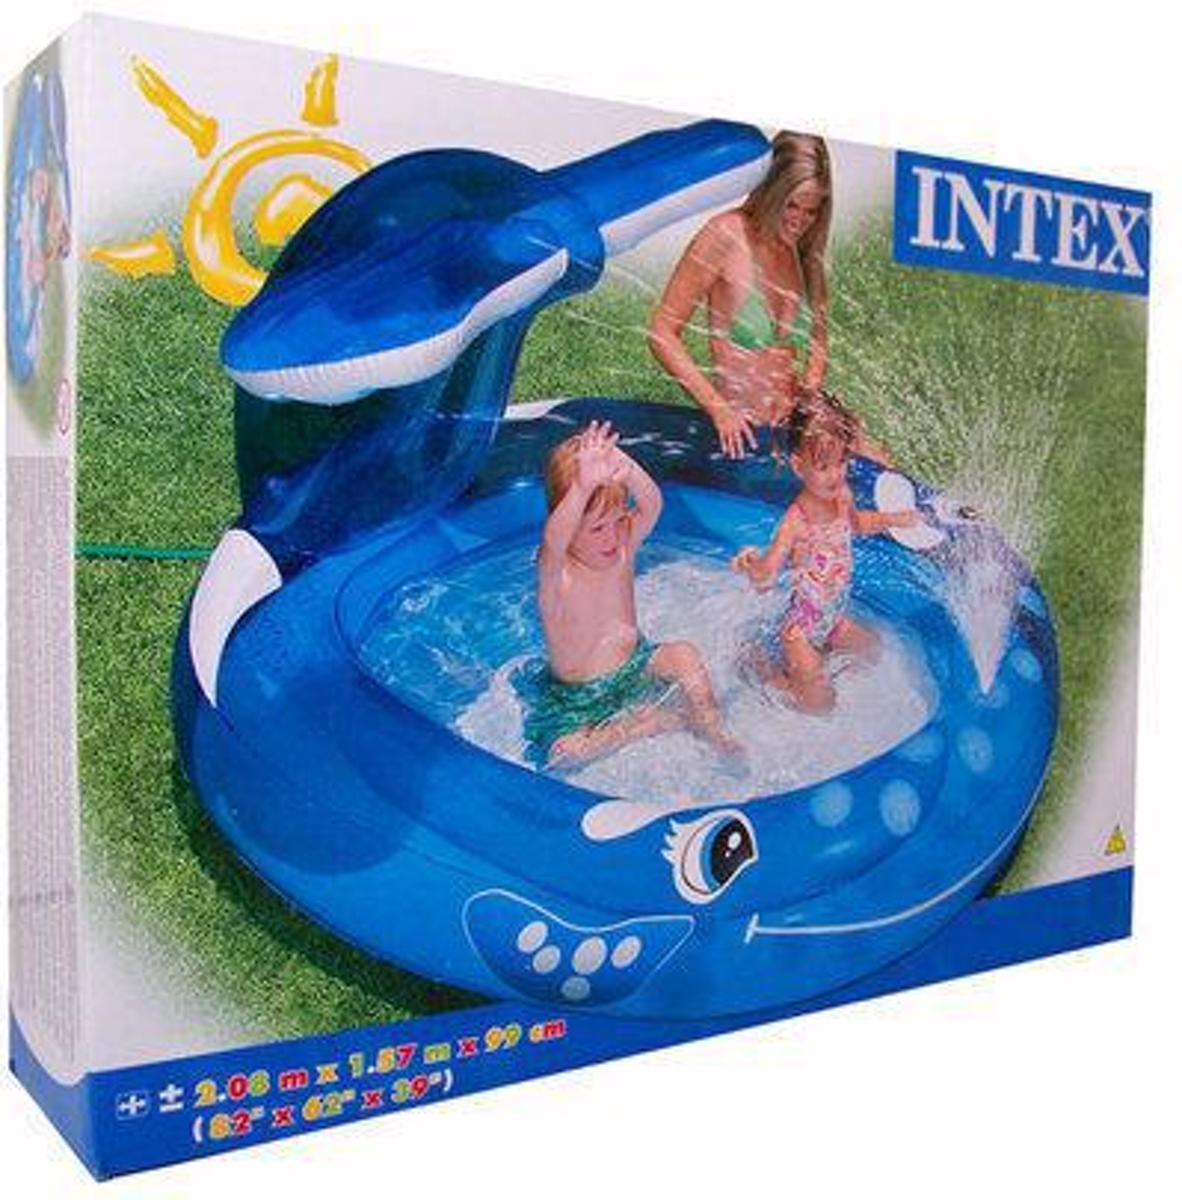 Intex zwembad walvis met spray 208x157x99cm